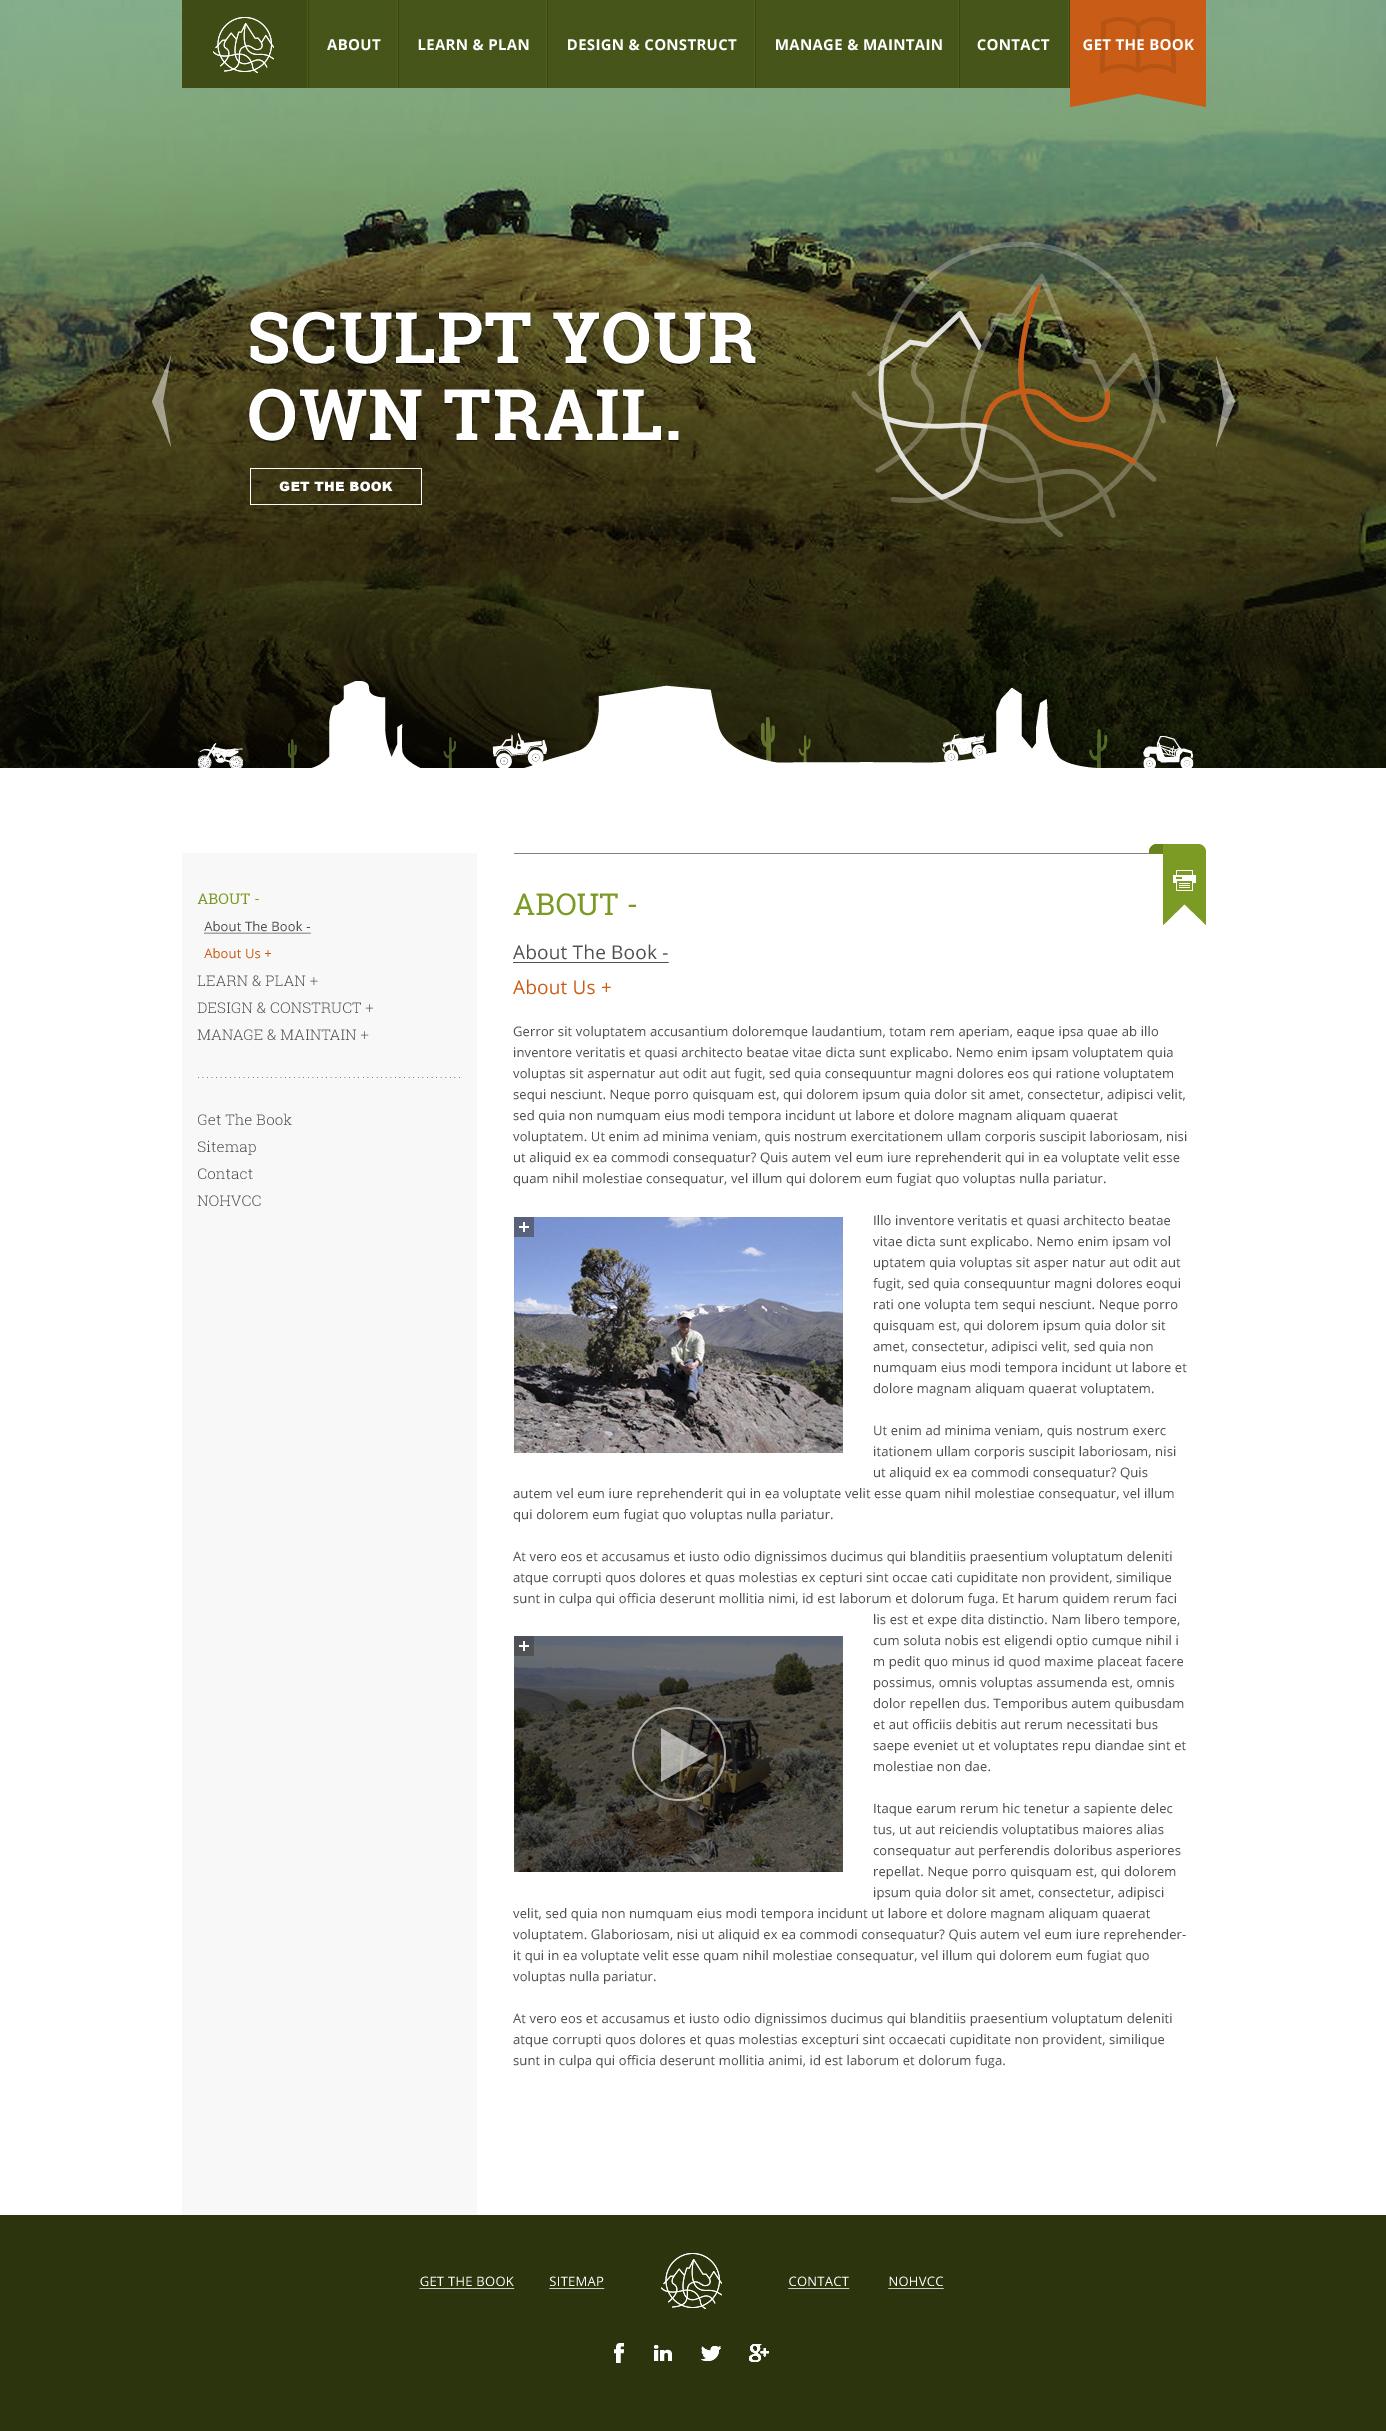 GreatTrails_Website_About_Page-Slide3_020515.jpg